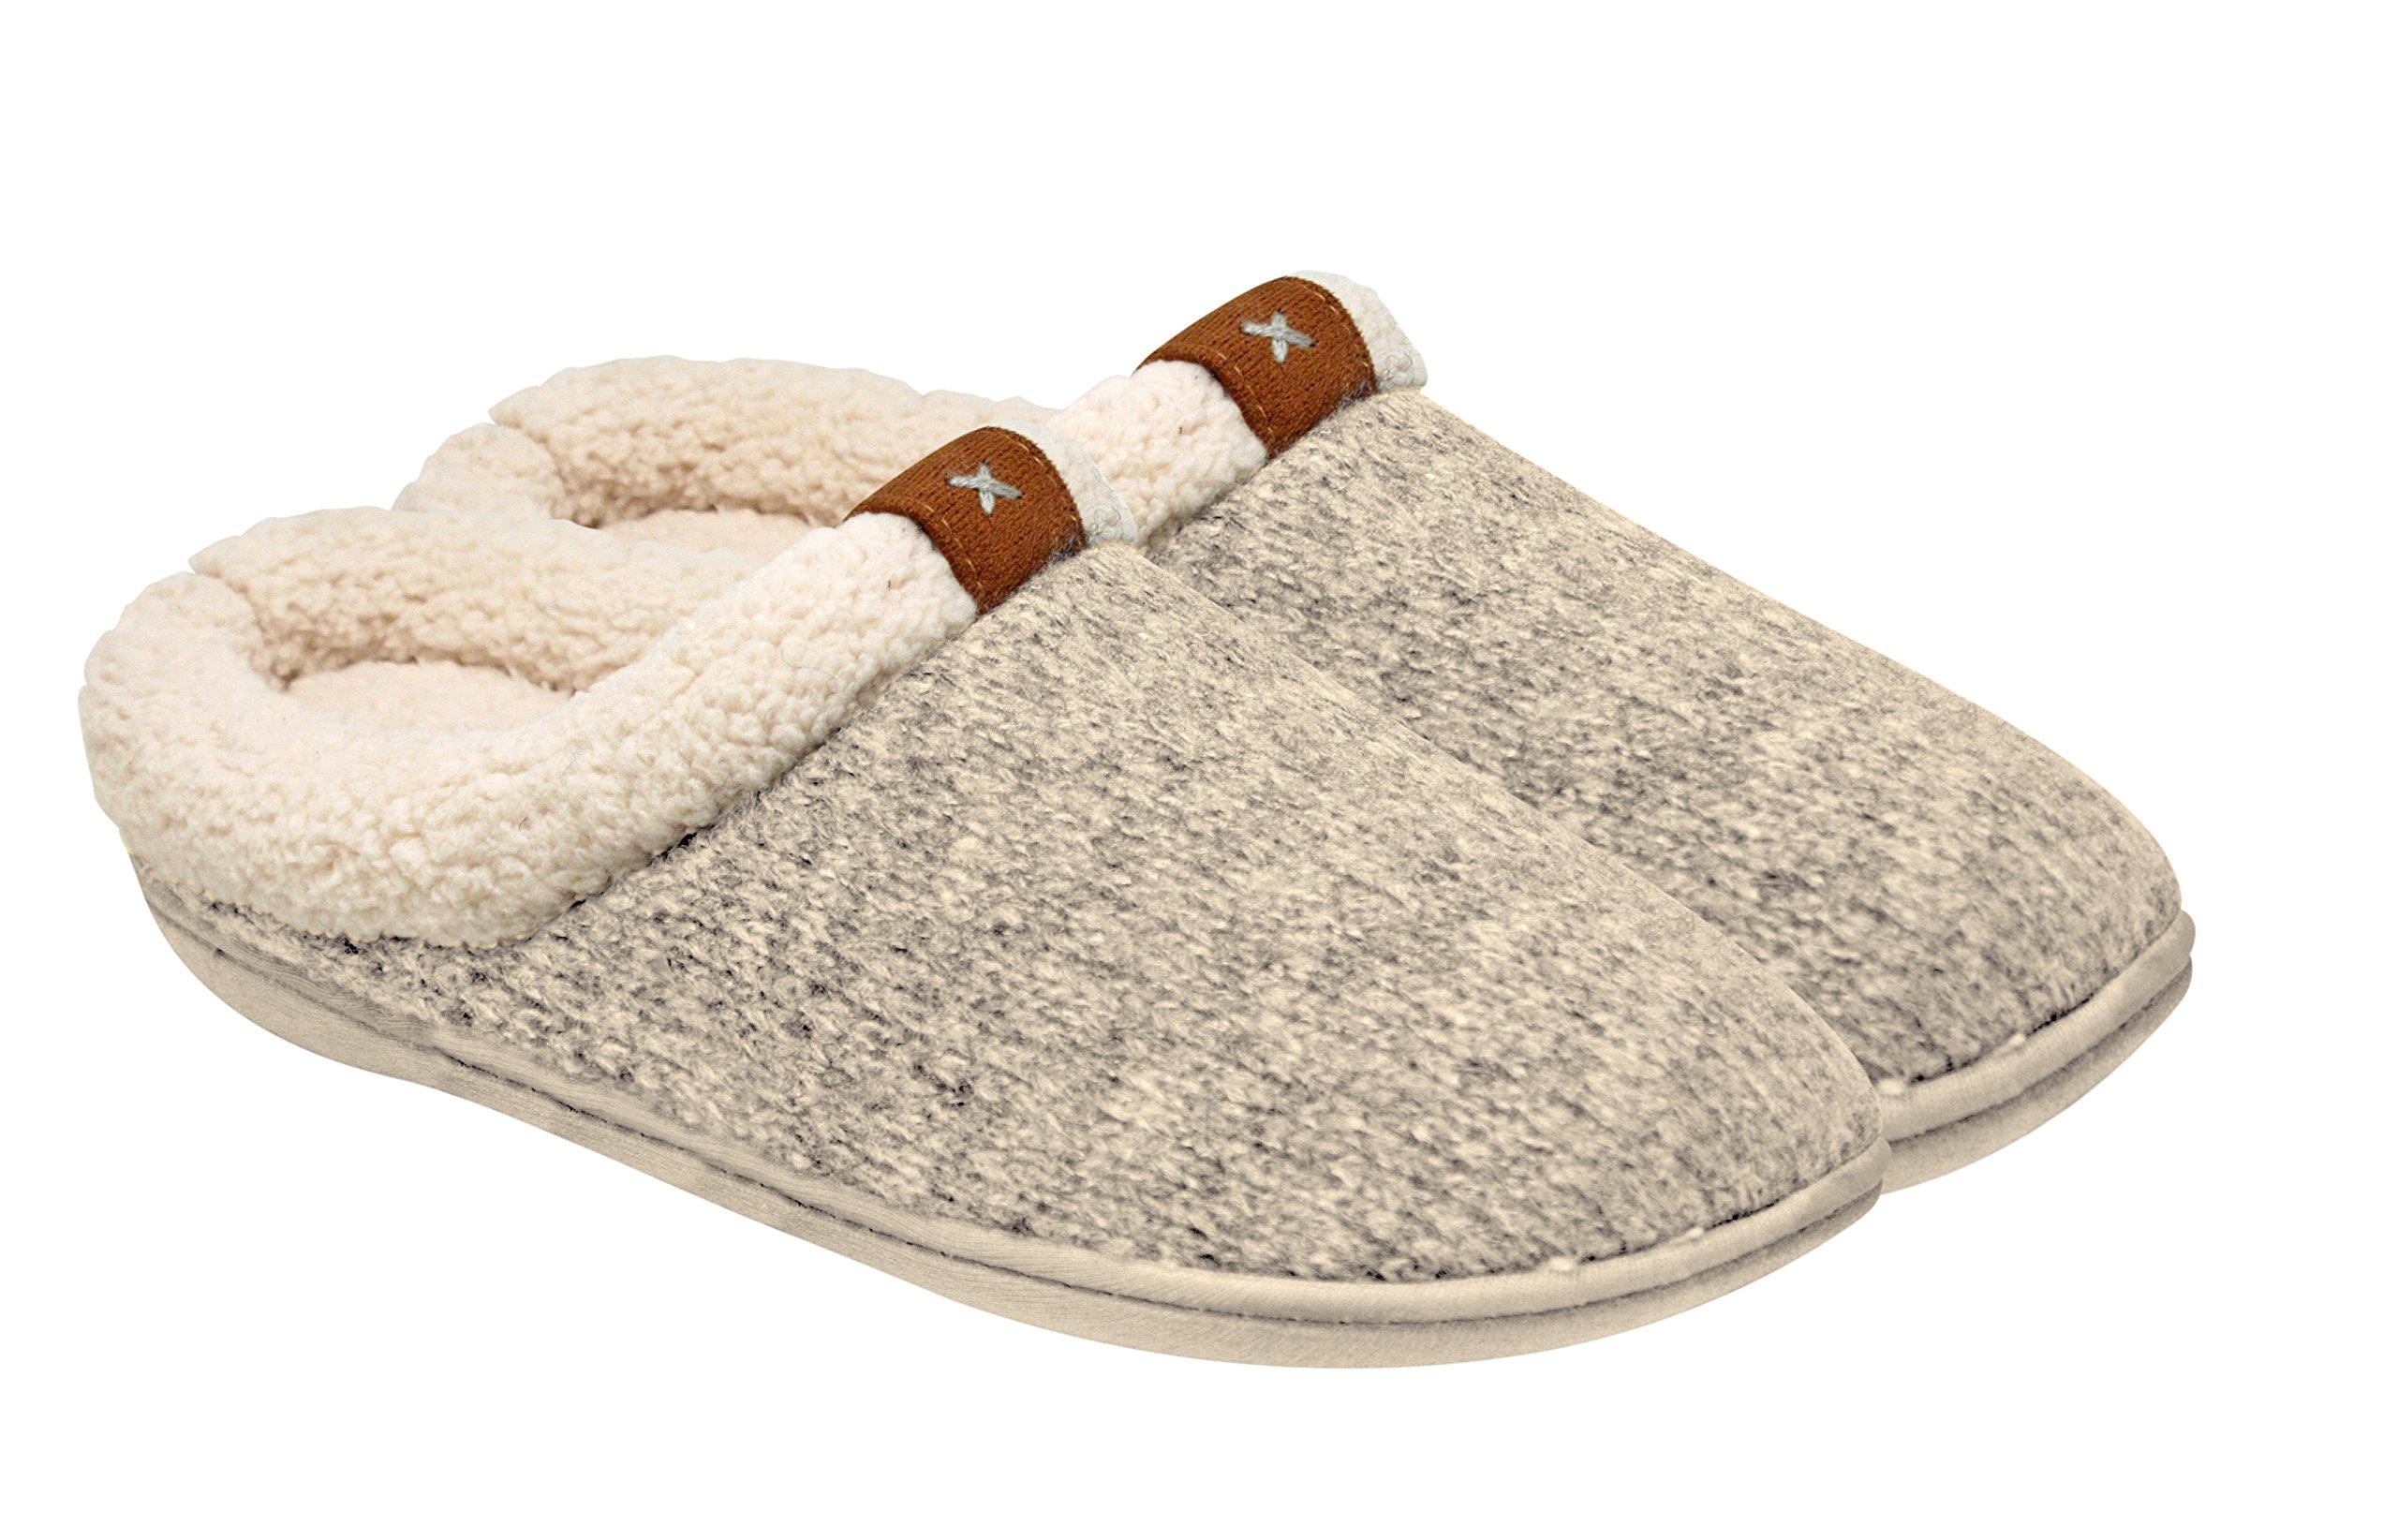 Adrienne Vittadini Women's Comfort Padded Memory Foam Sherpa House Slipper w Slip-Resistant Rubber Sole| Indoor/Outdoor